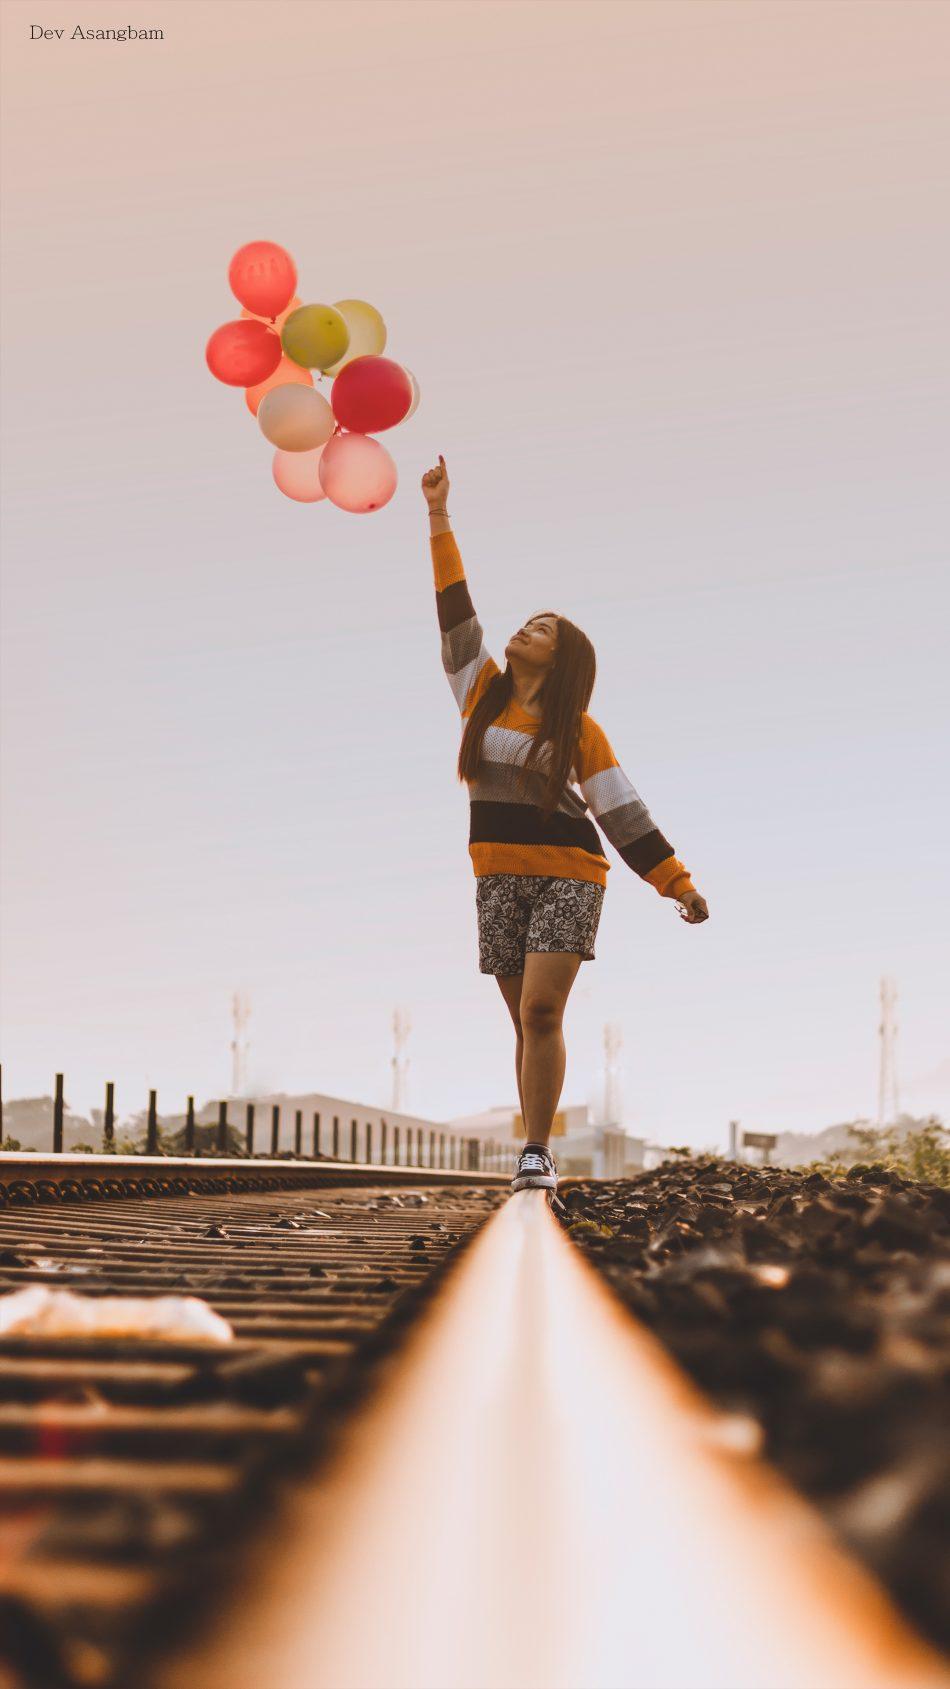 Happy Girl Balloons Train Track Graphy 4k Ultra Happy